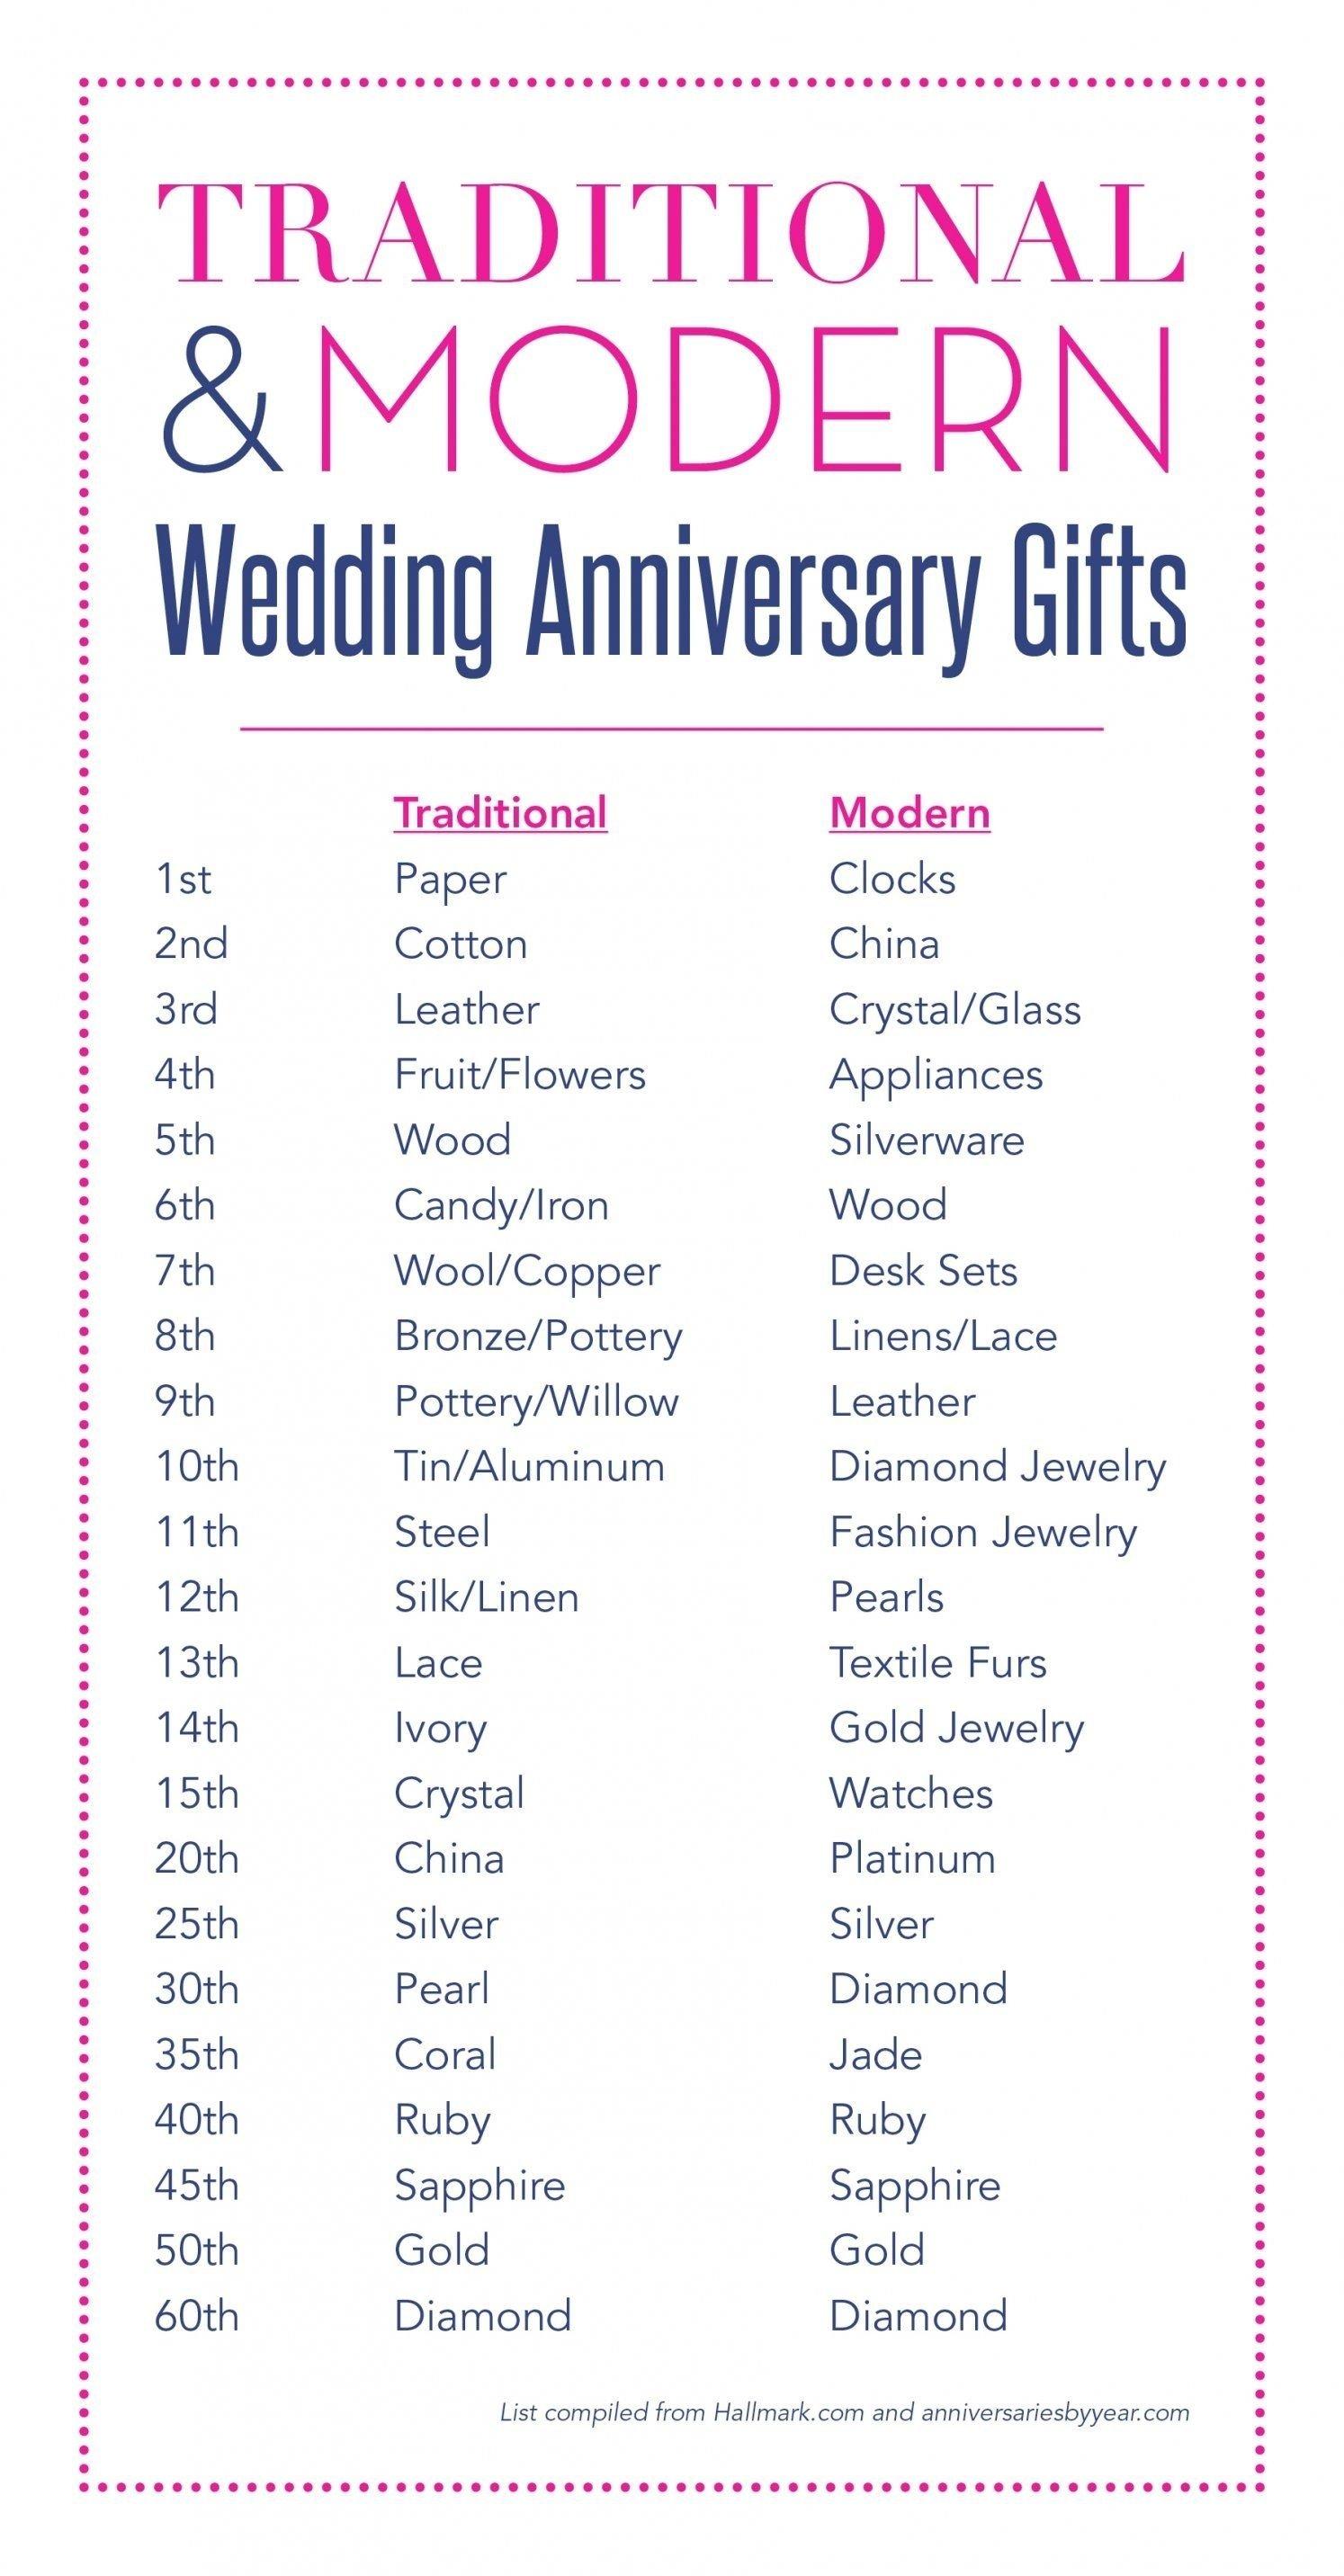 10 Cute 15Th Wedding Anniversary Gift Ideas 32 gorgeous traditional wedding anniversary gifts ideas wedding 2